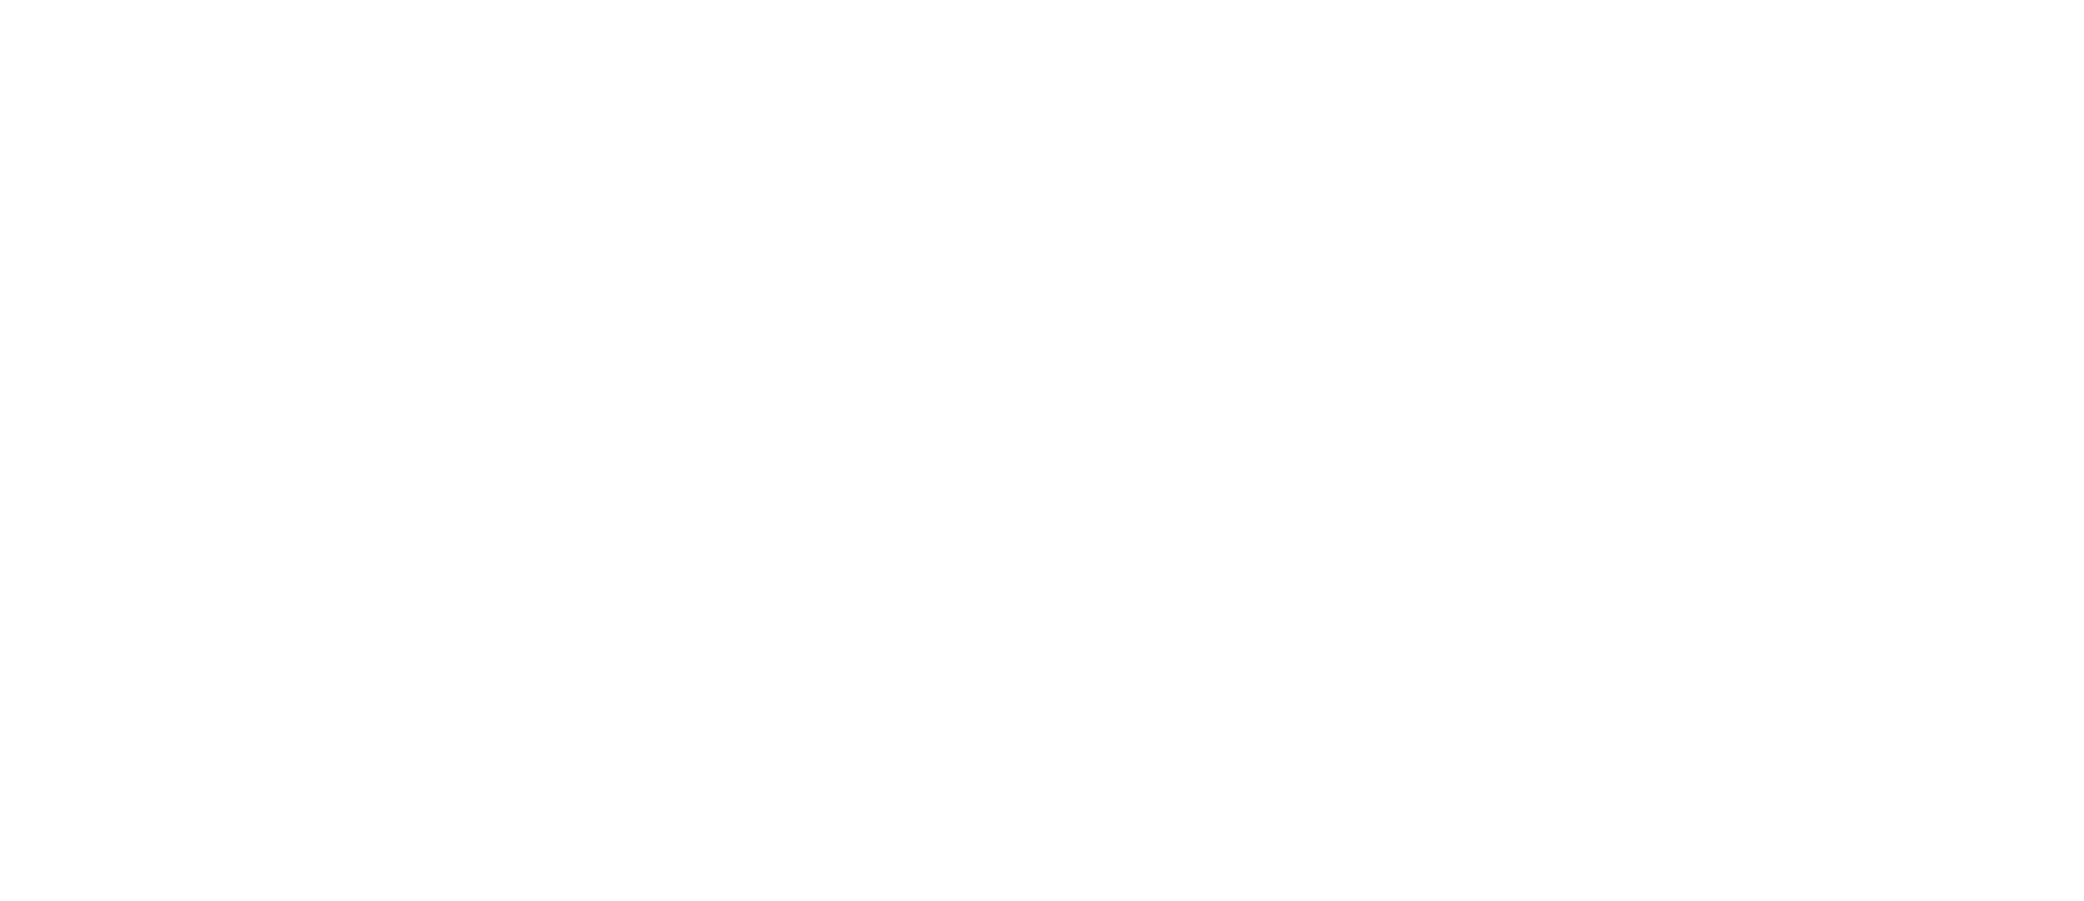 GradientVentures-Lockup-SingleColor-W